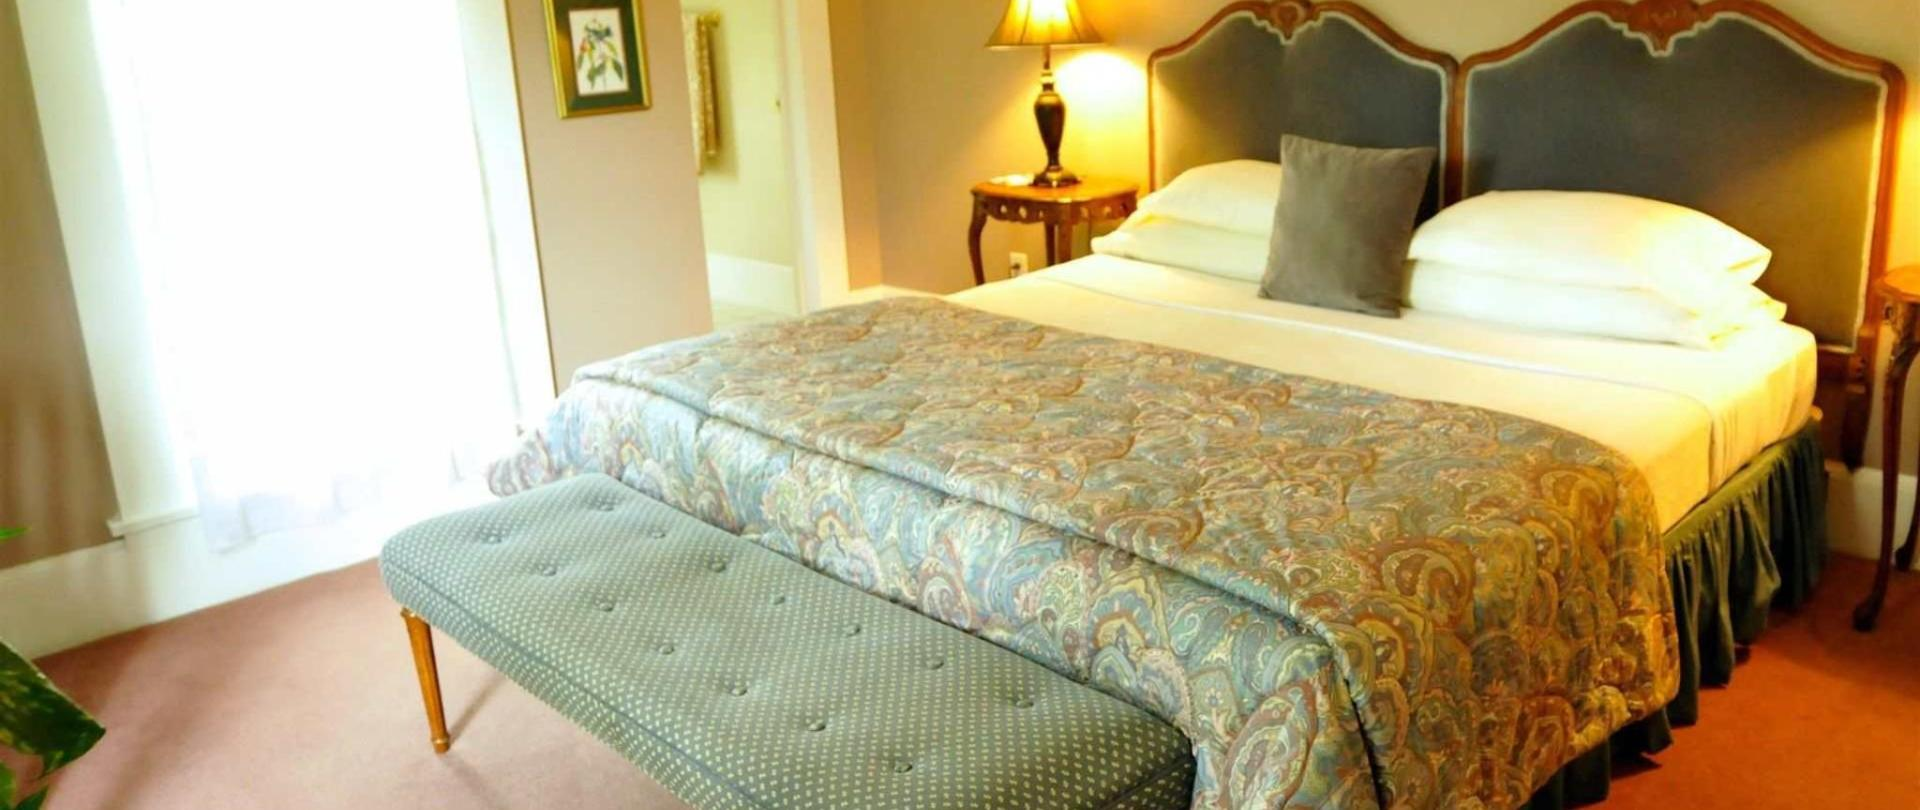 caldwell-suite-prairie-guest-house.jpg.1920x0.jpg